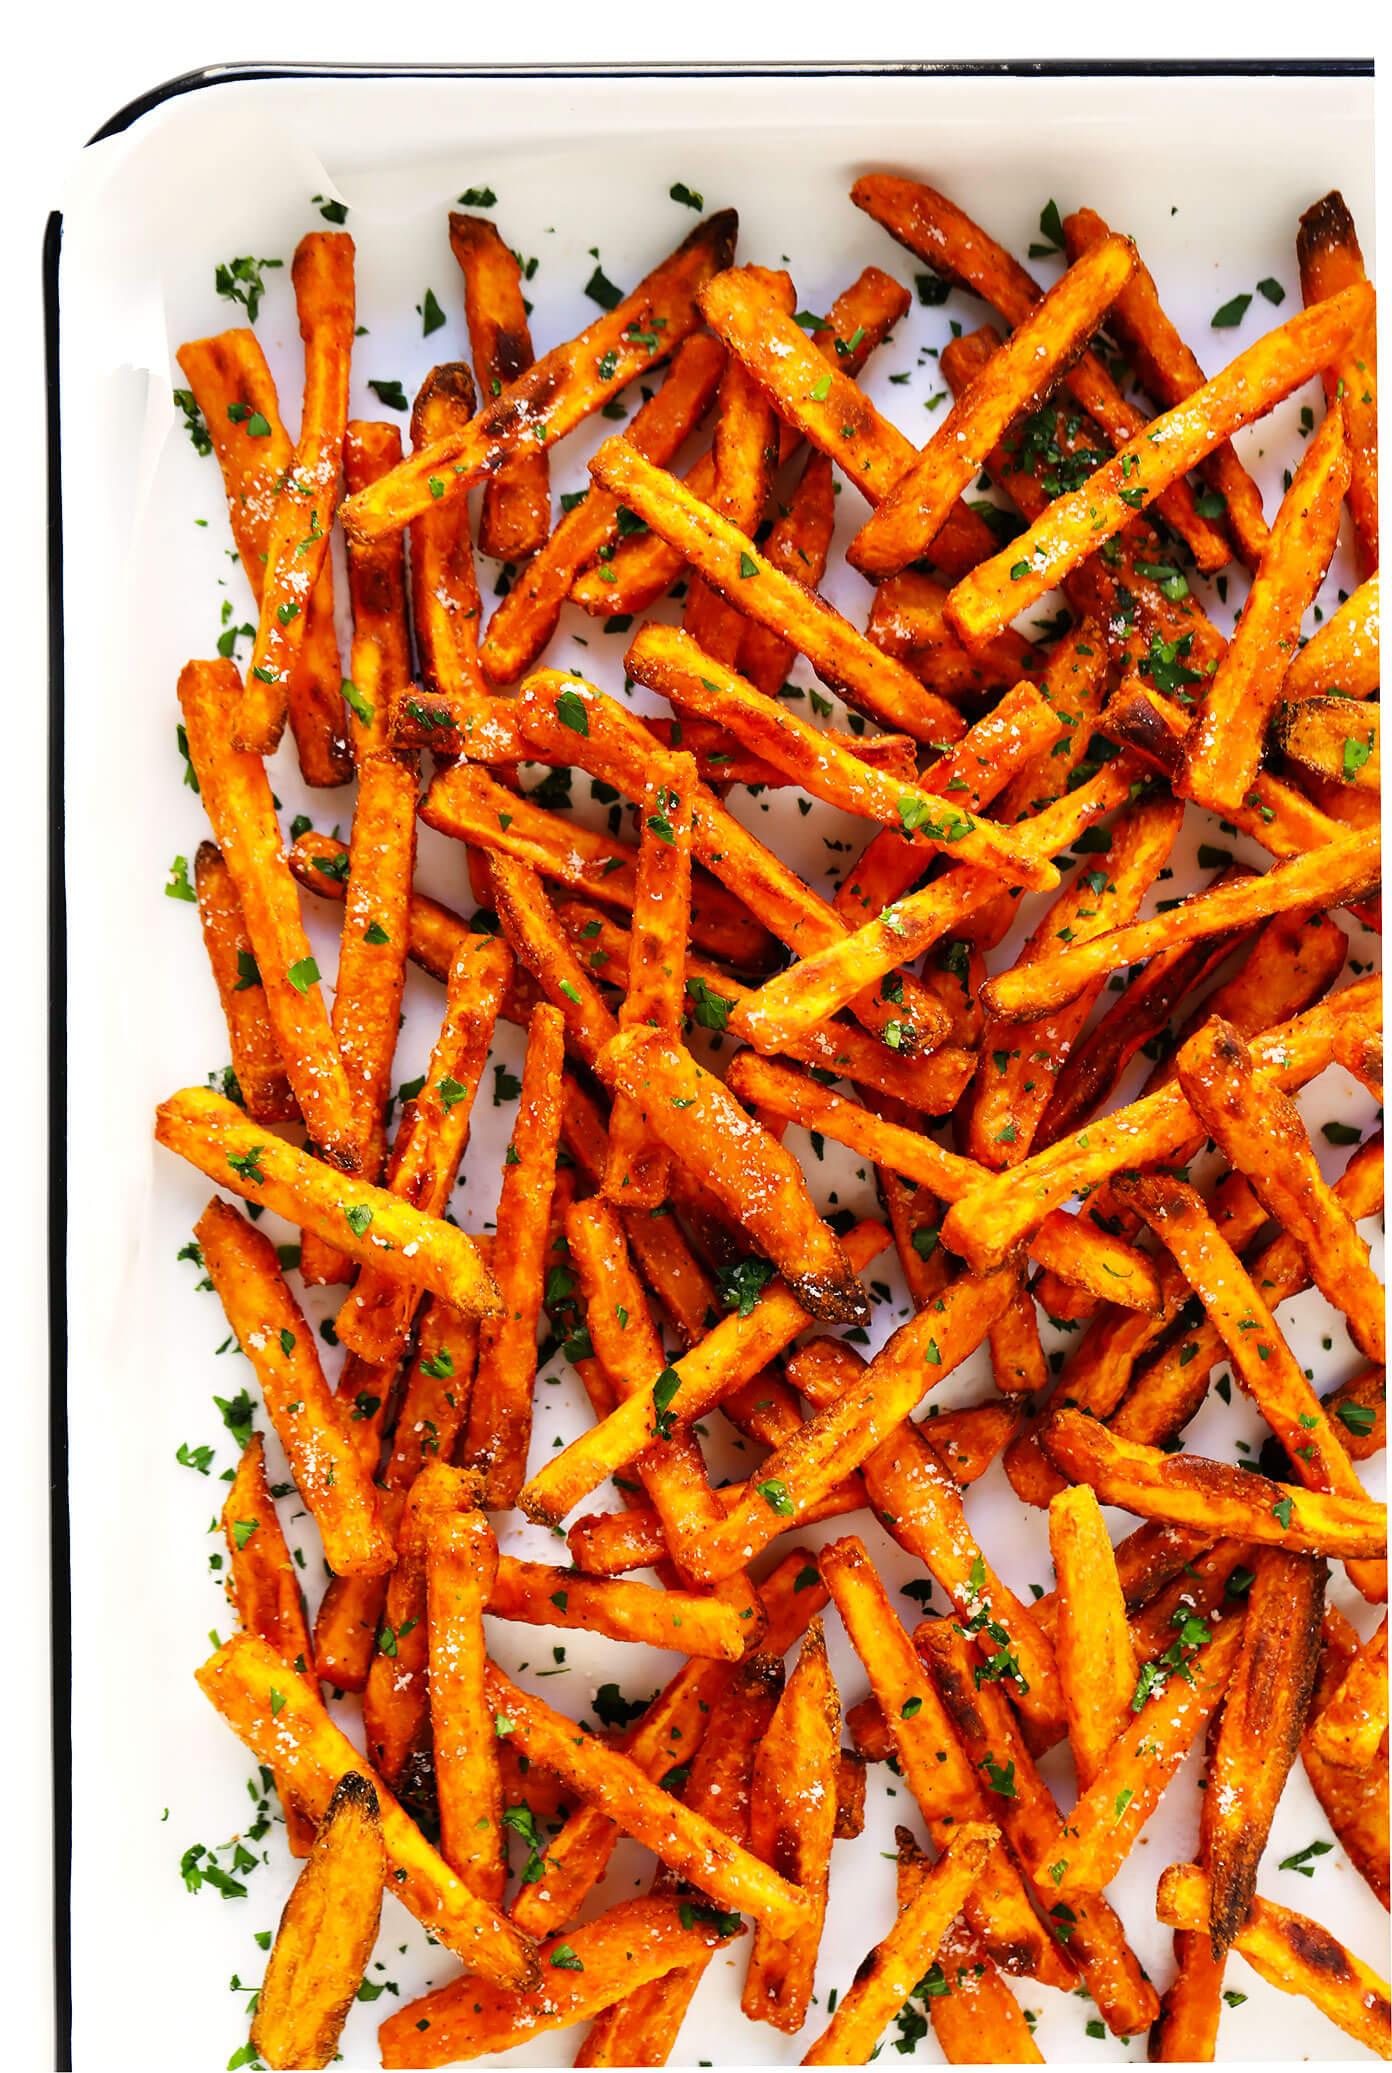 The-Best-Crispy-Baked-Sweet-Potato-Fries-Recipe-1.jpg